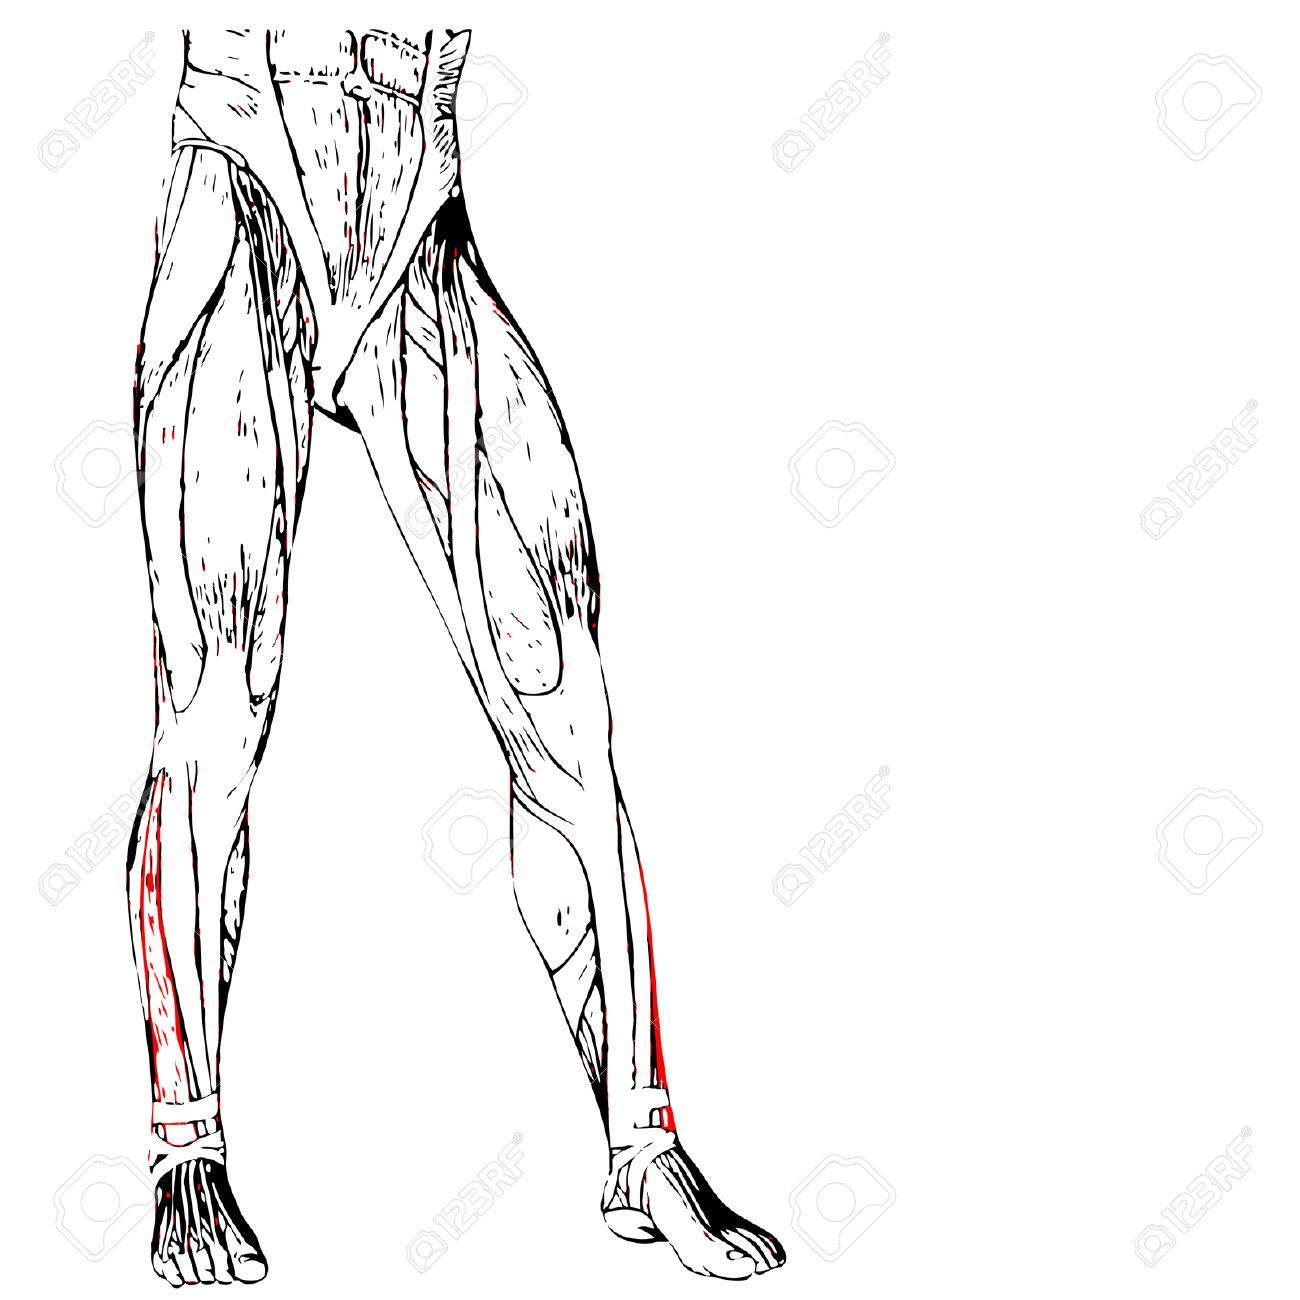 Leg Muscle Drawing At Getdrawings